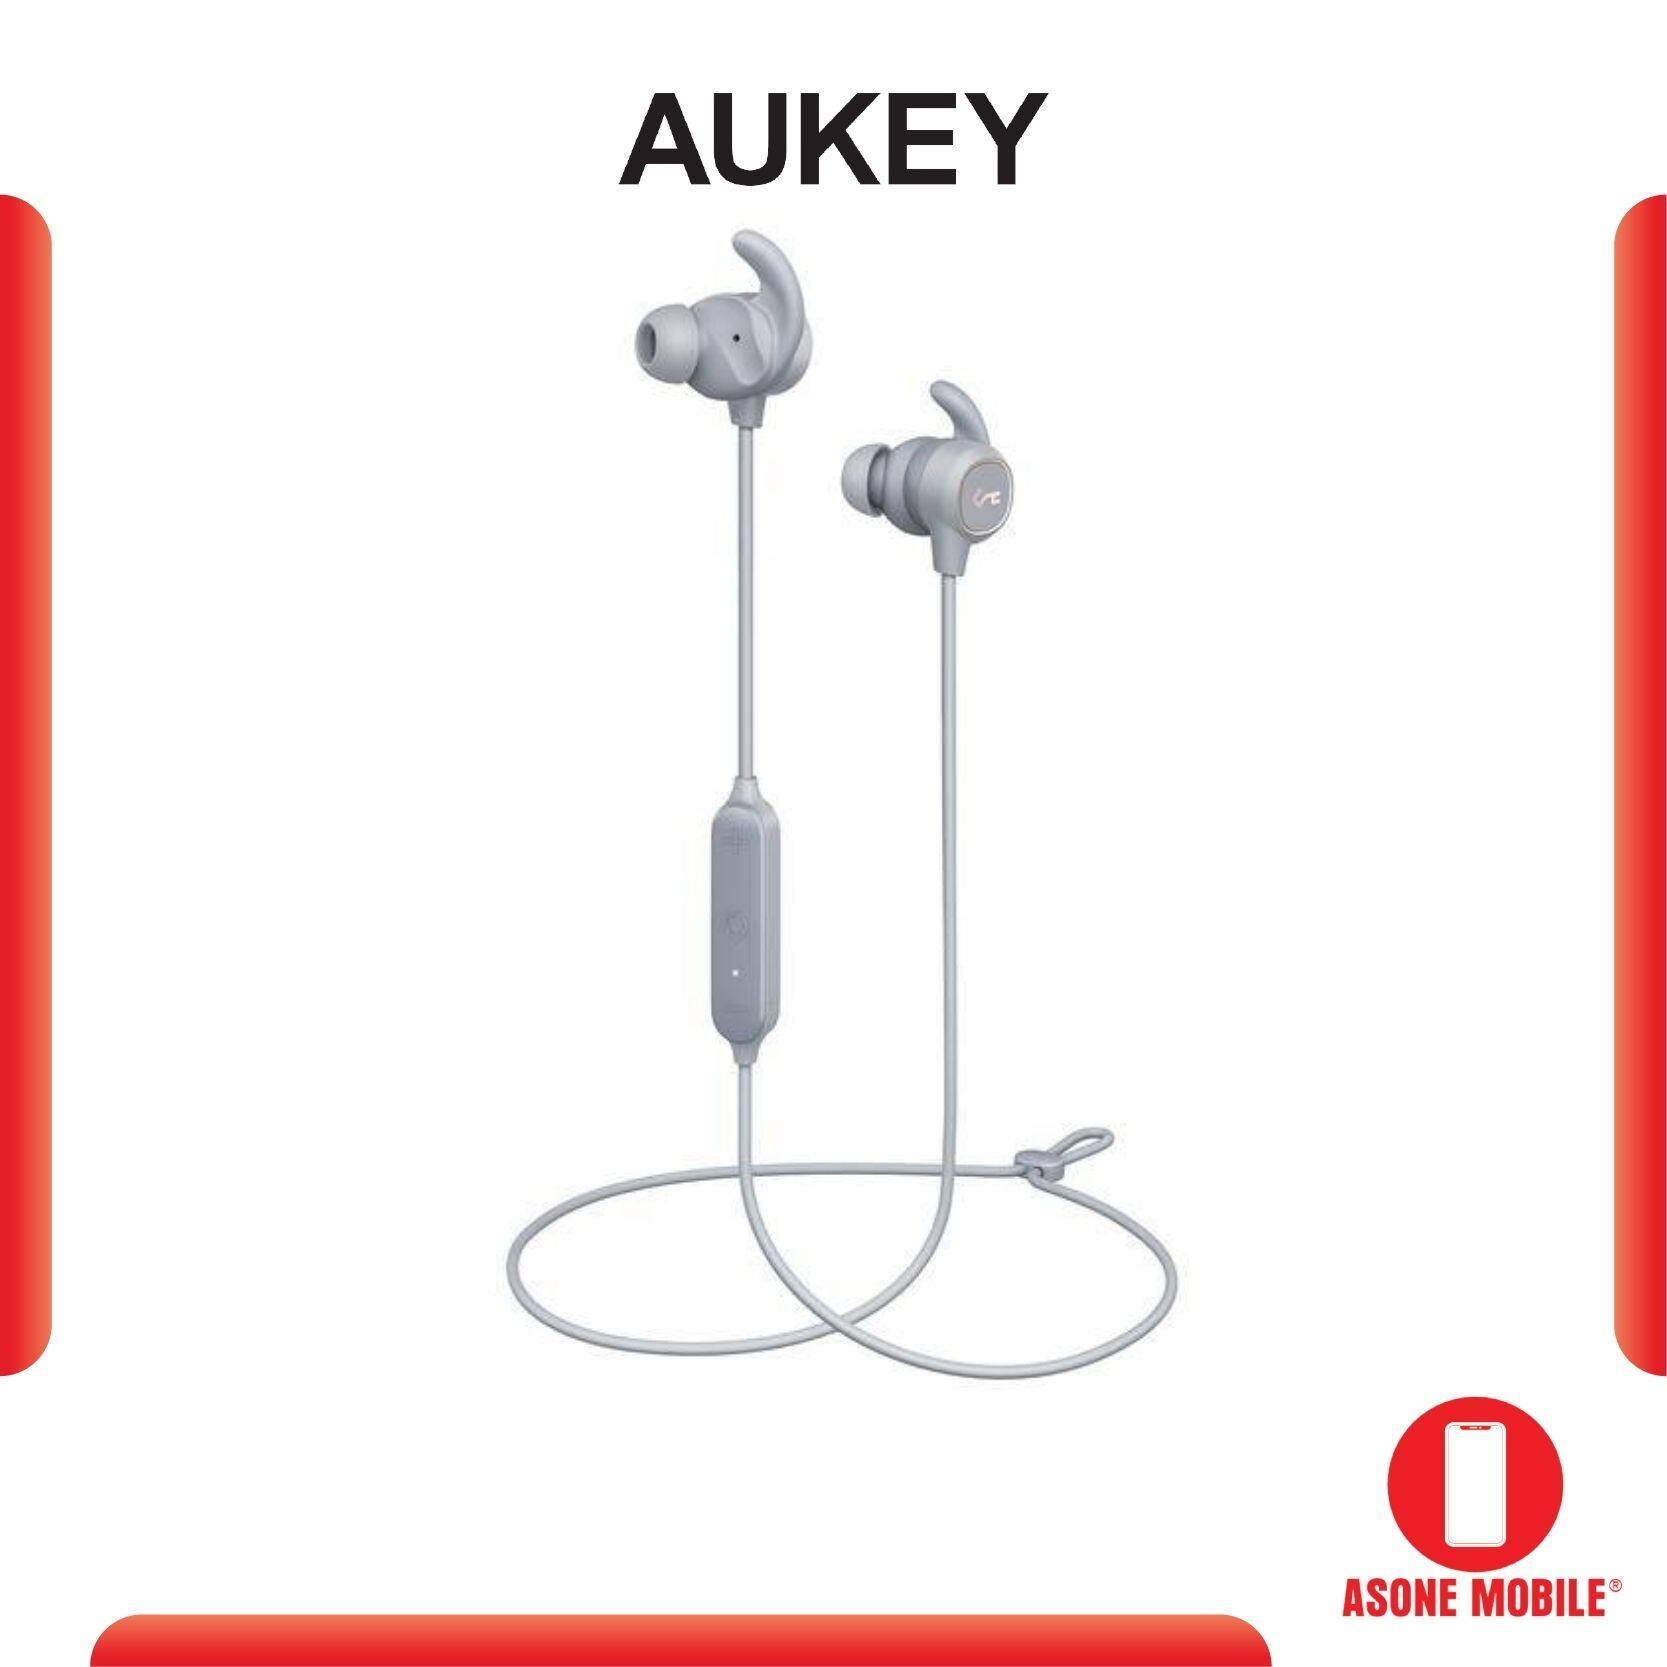 Original Aukey EP-B60 Key Series Bluetooth 5 IPX6 Water-Resistance Sport Wireless Earbuds